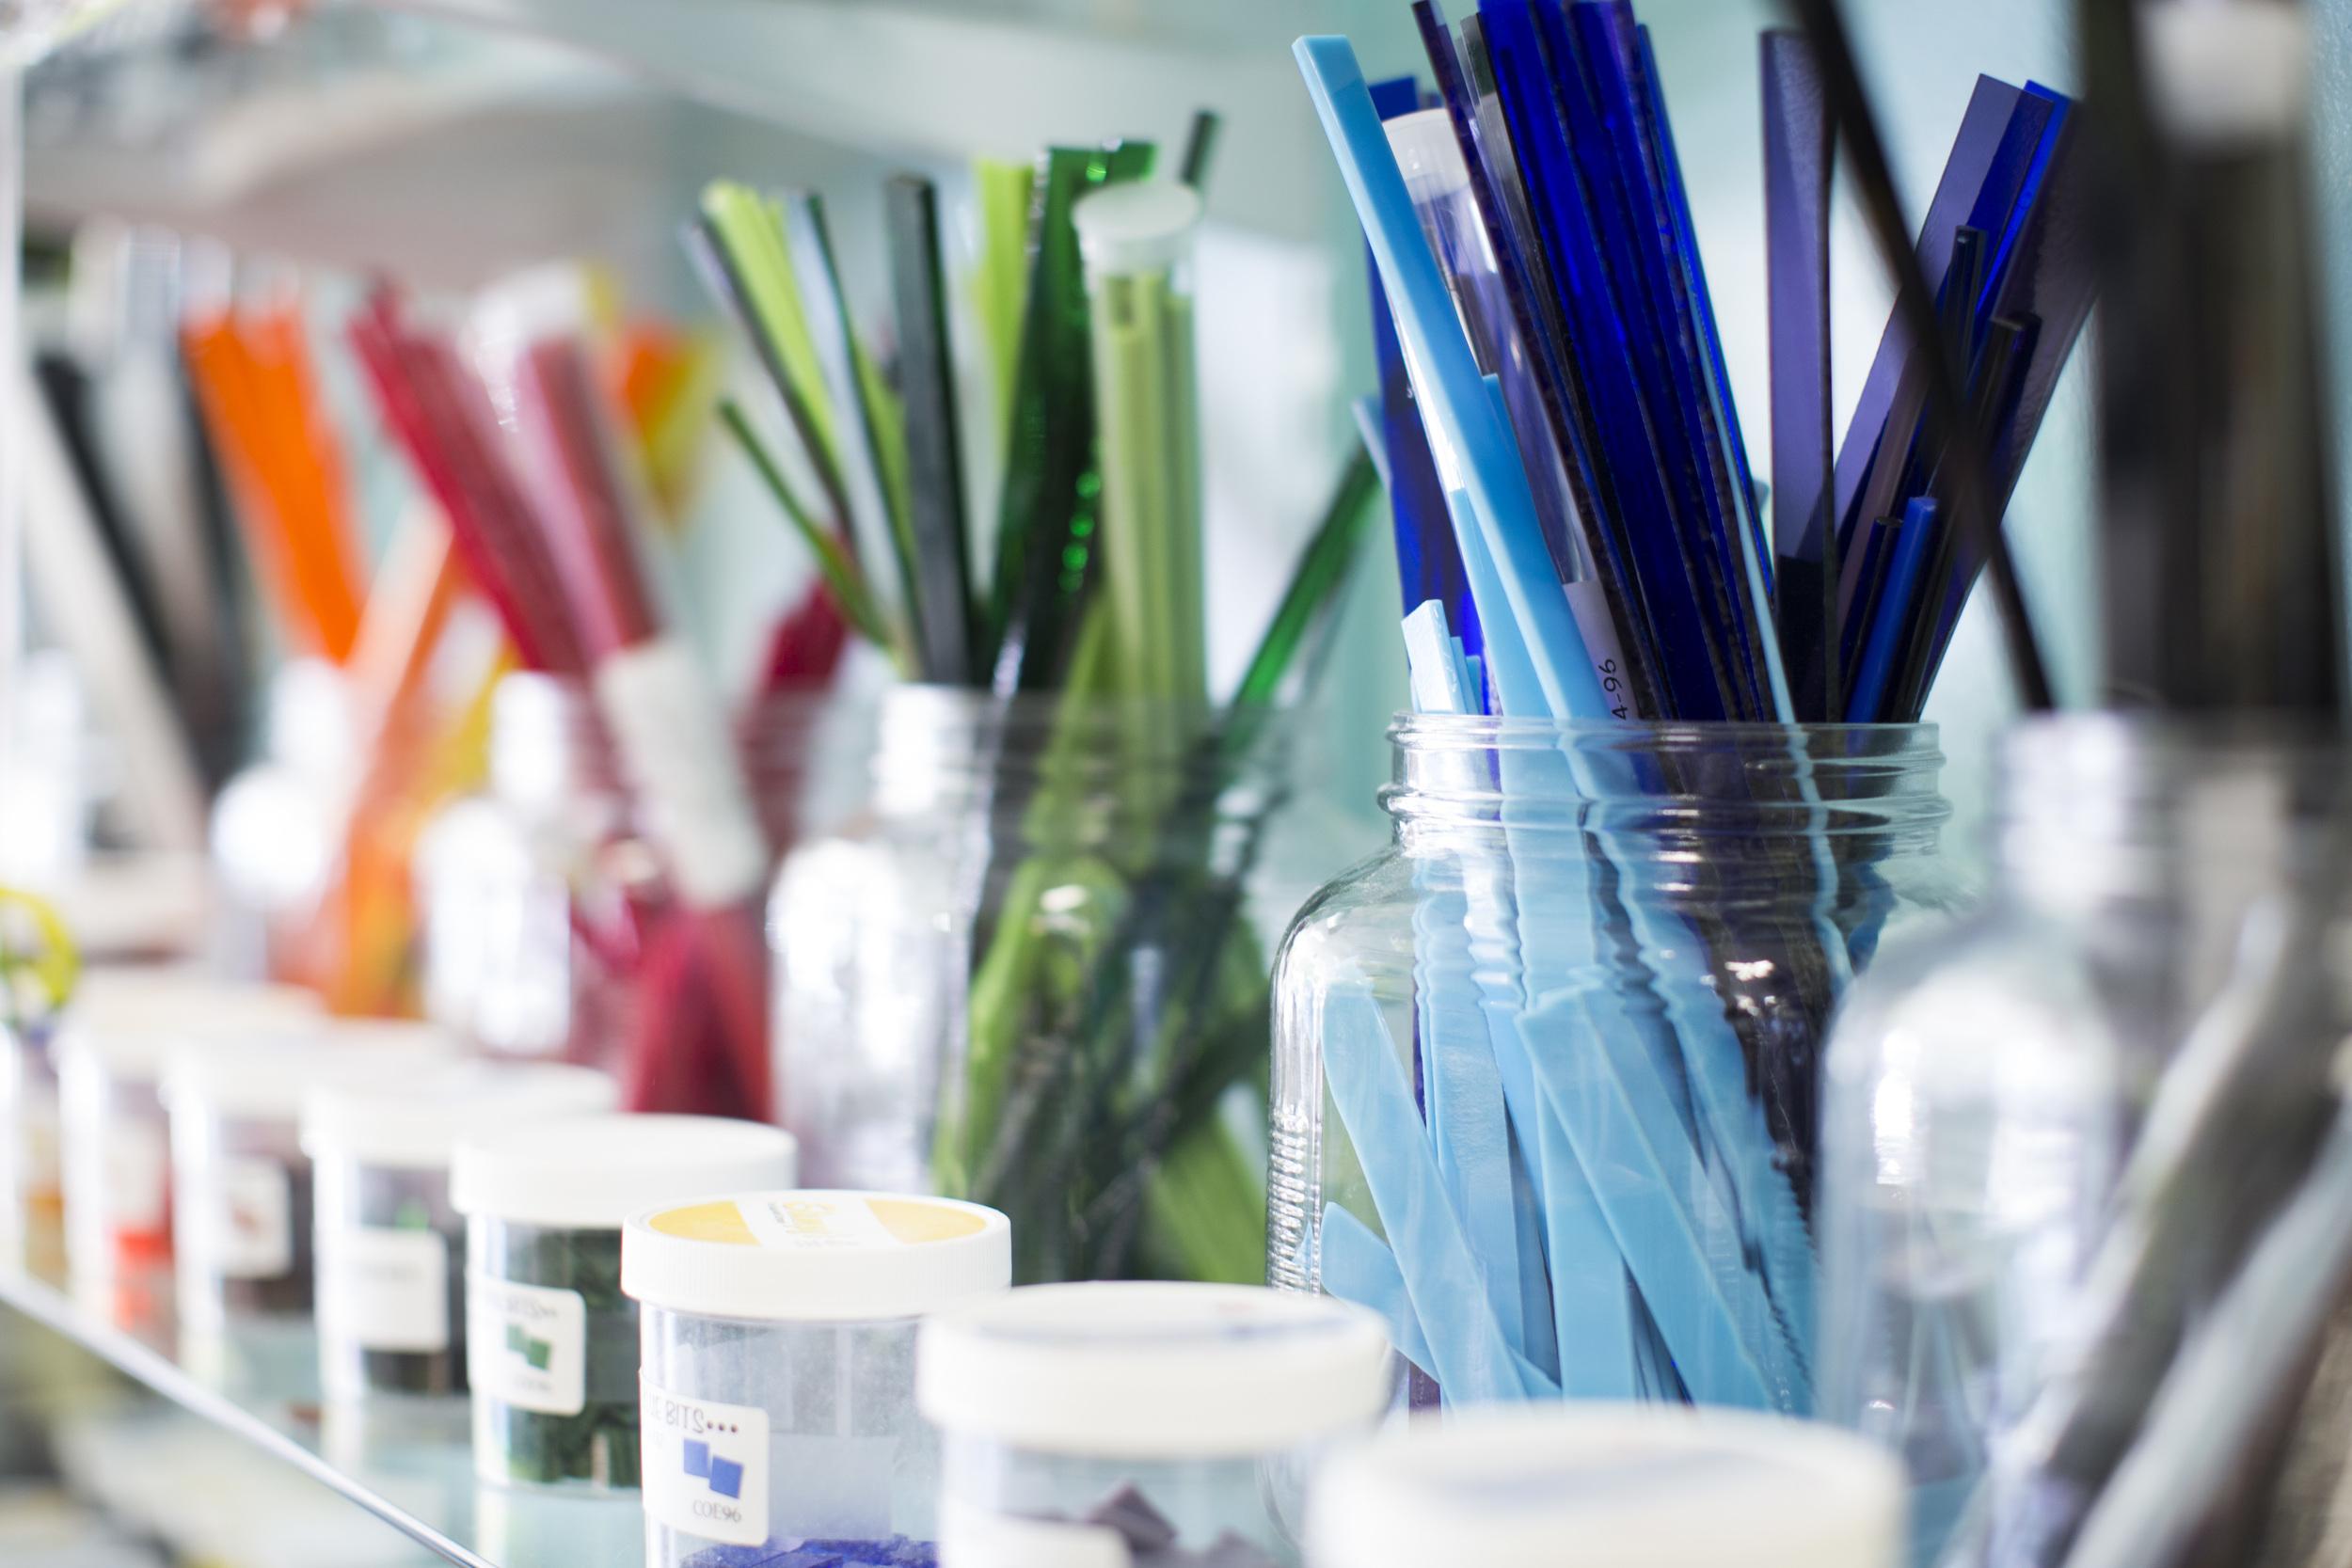 Glass supplies for DIY glass fusing